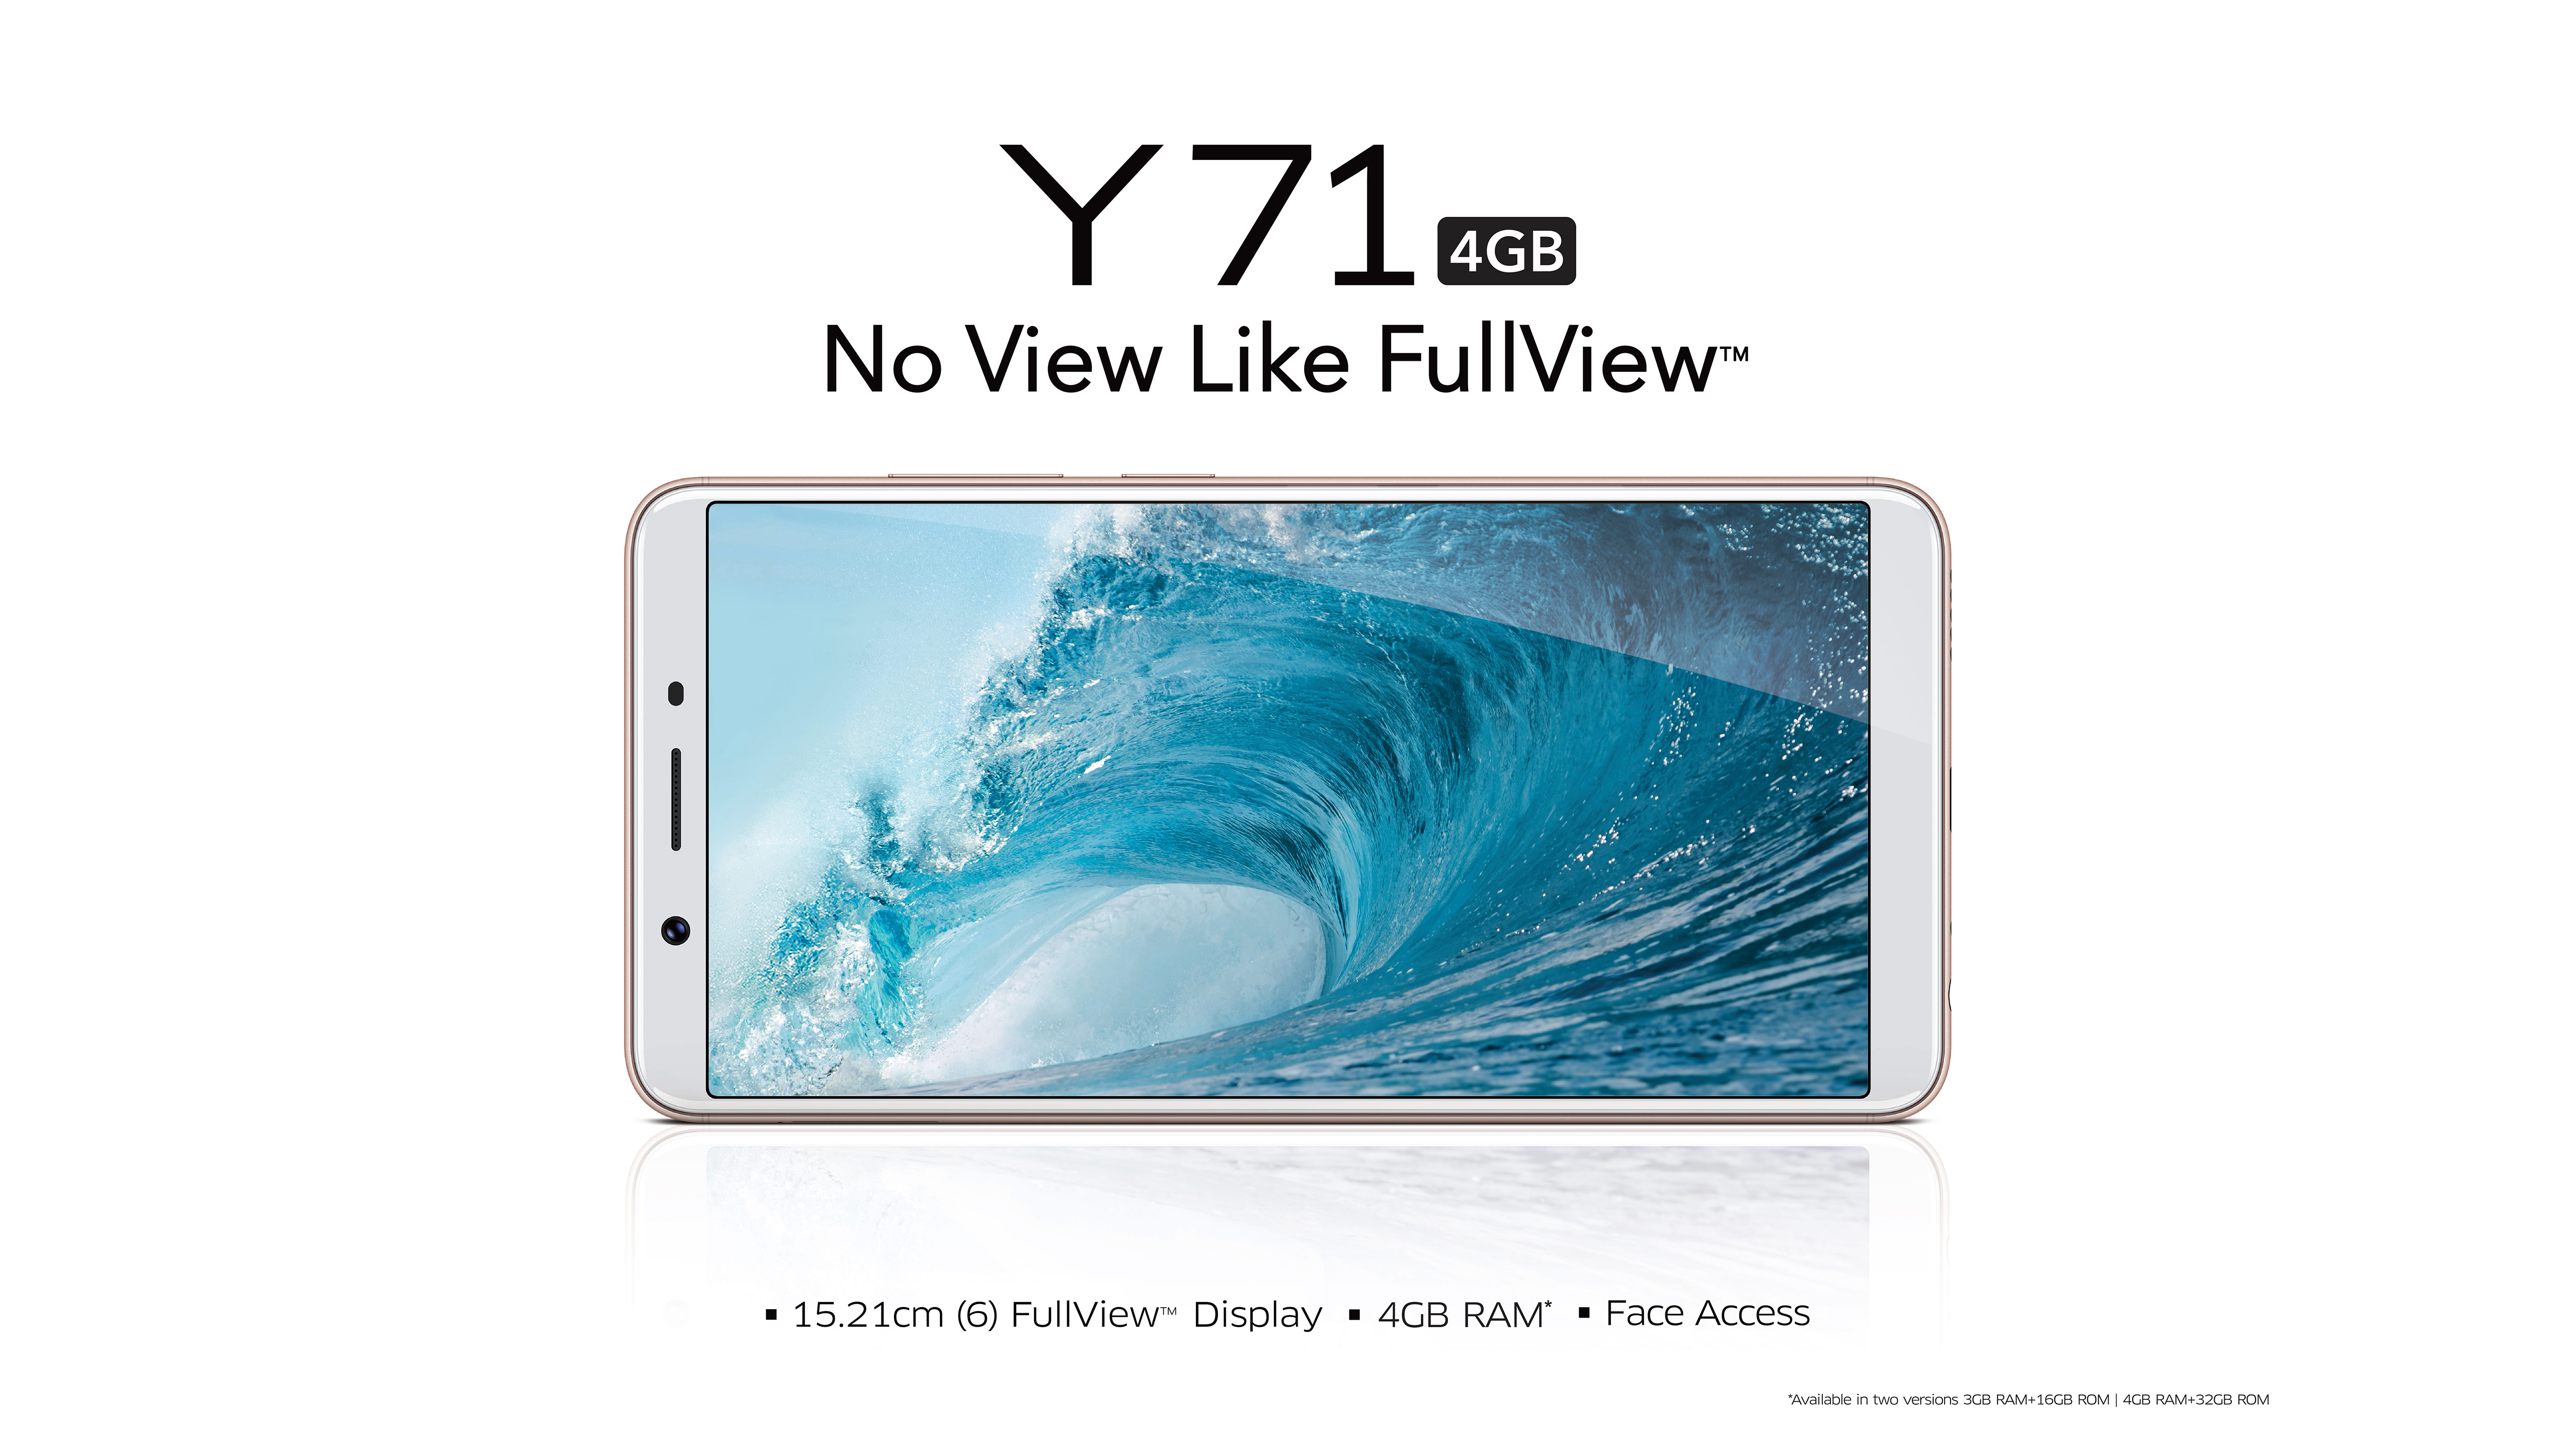 Vivo Y71 | Vivo India